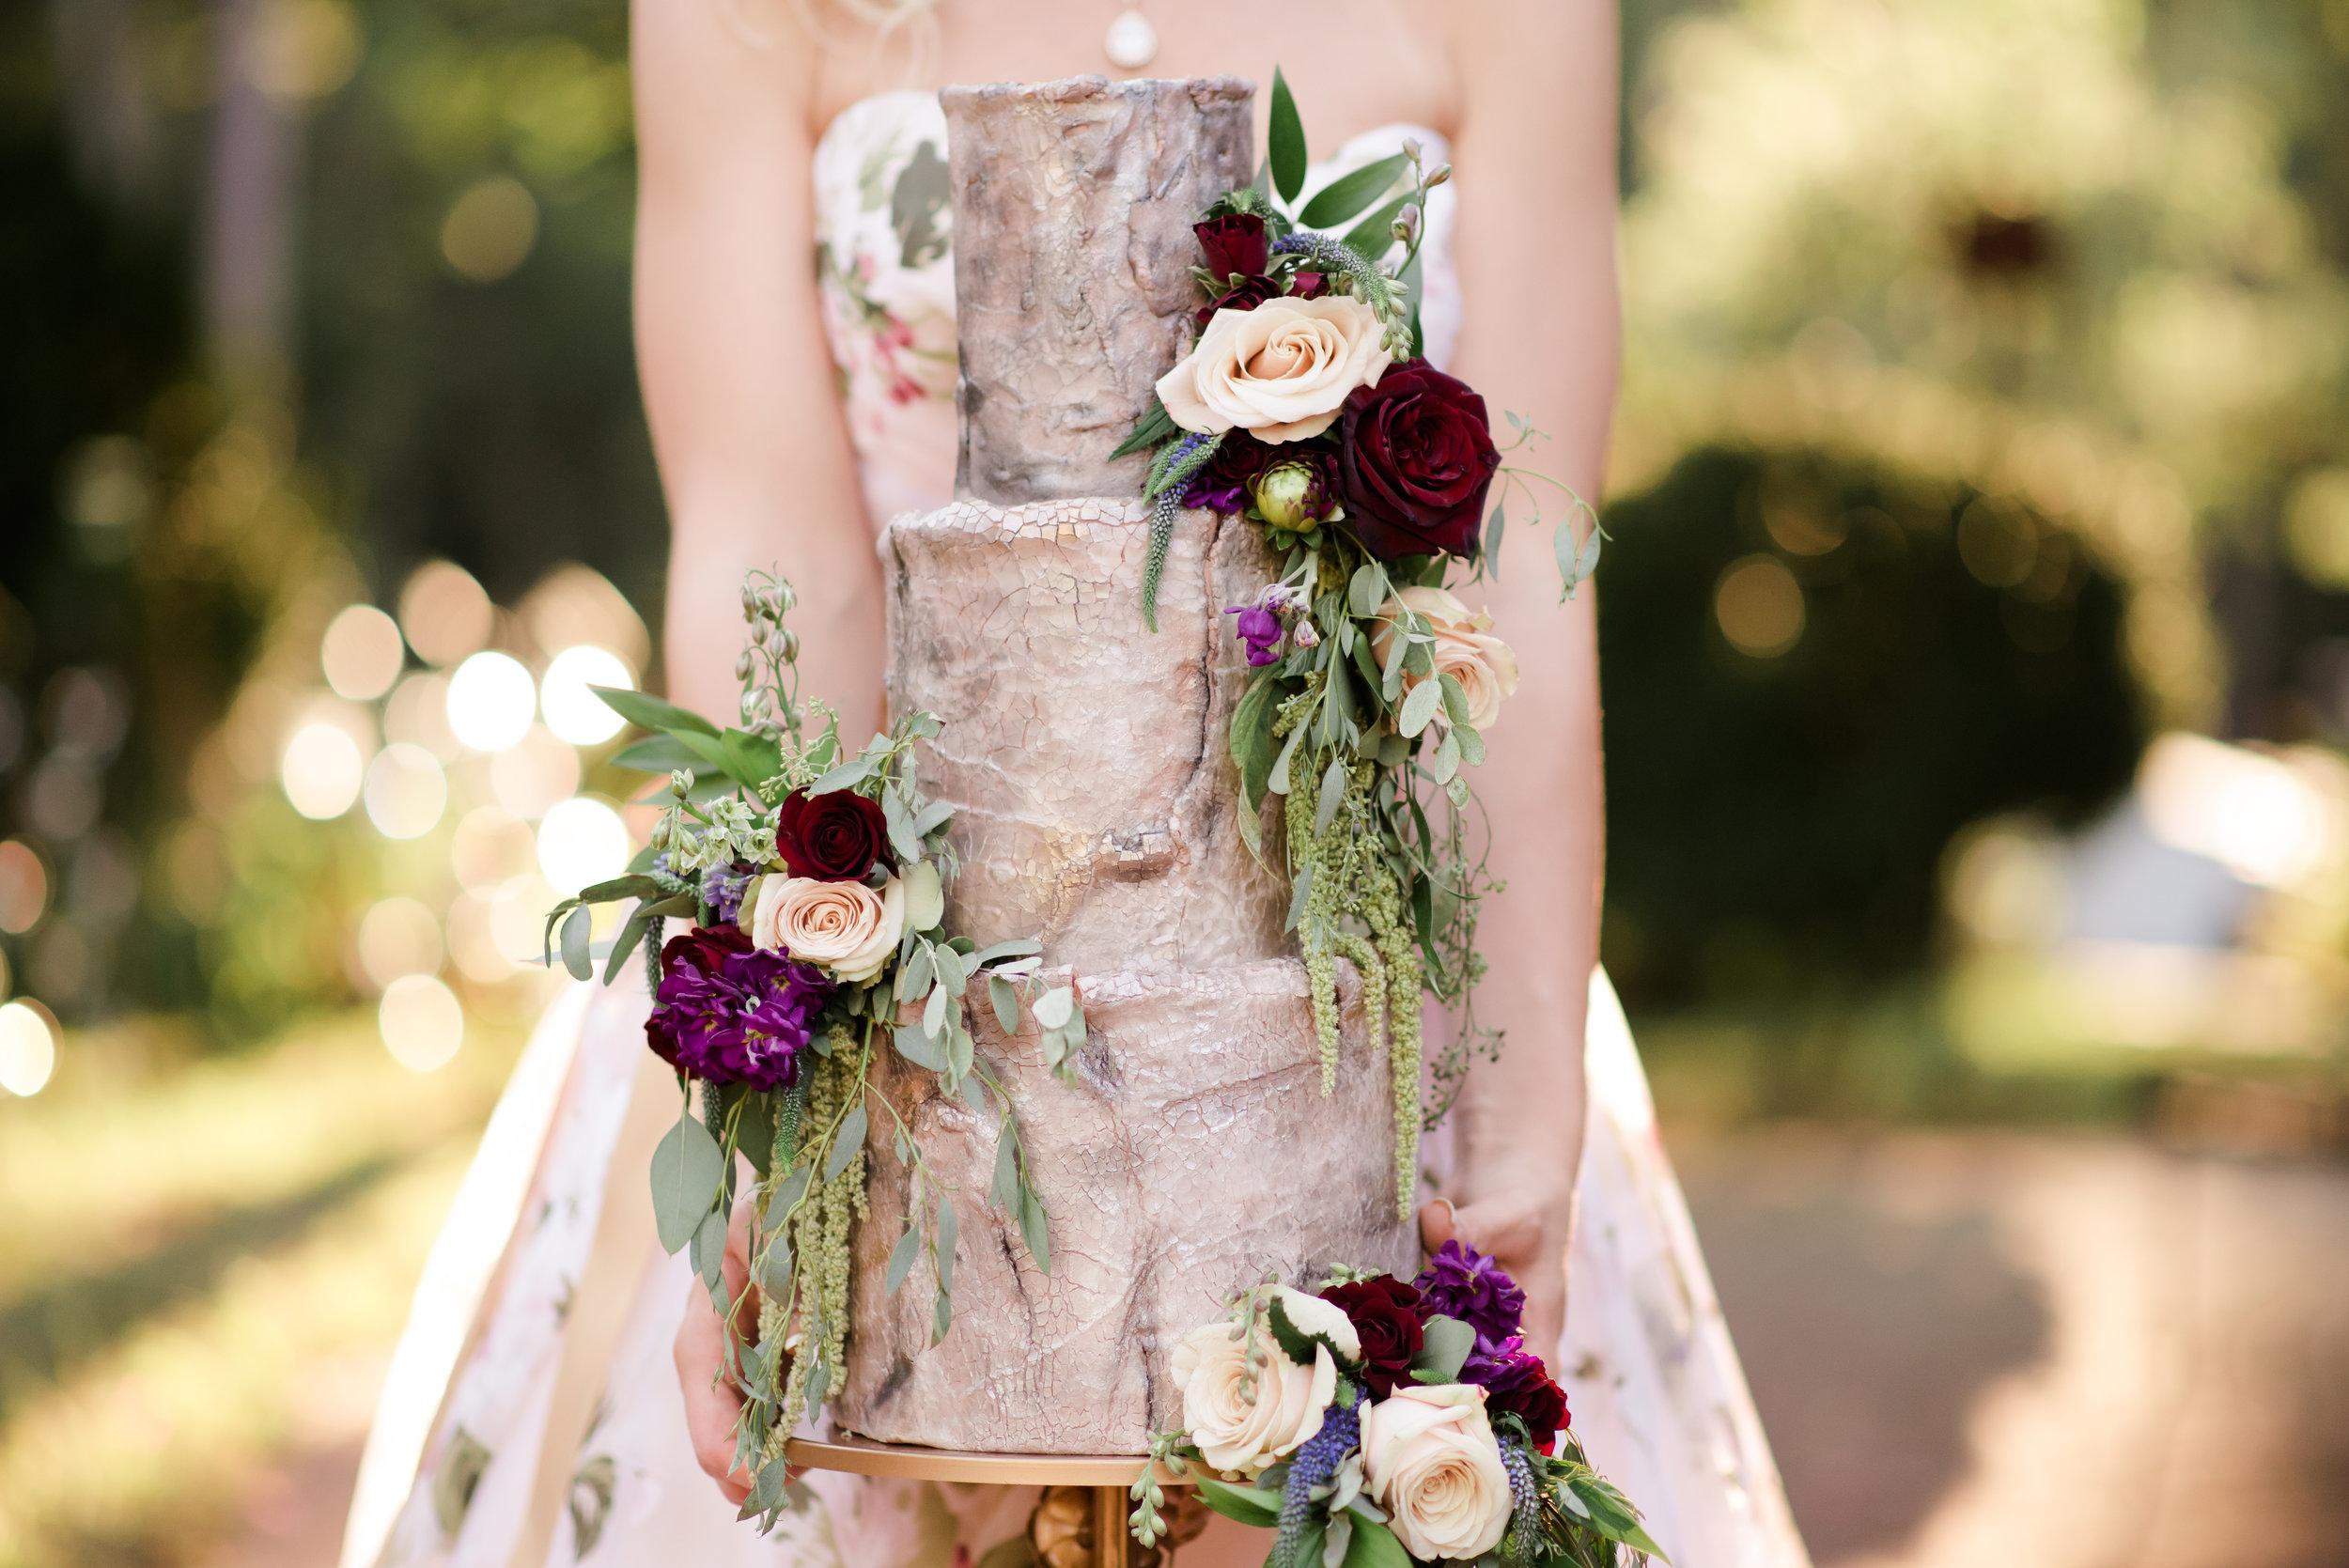 midsummers-eve-wedding-floral-blush-dress-david-tutera-cary-hill-plantation-photo-virginia-bride-230.jpg